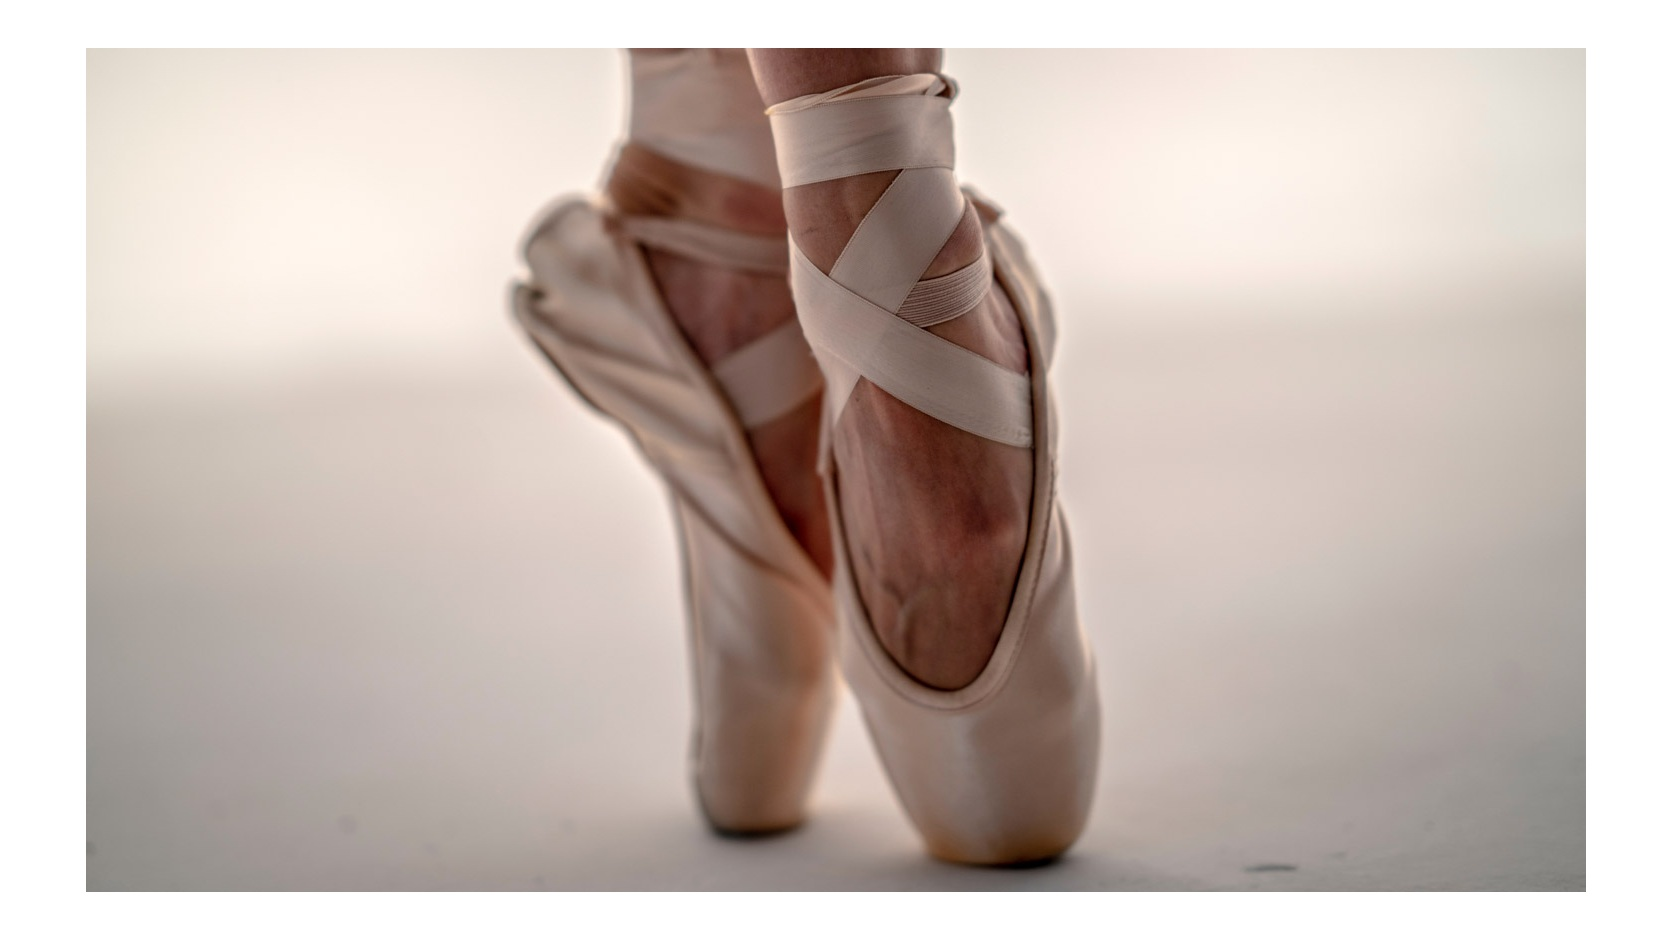 balance-by-heather-gream-ballet-shoes-nihal-demirci-UYG1U5wj3Tk-1500.jpg